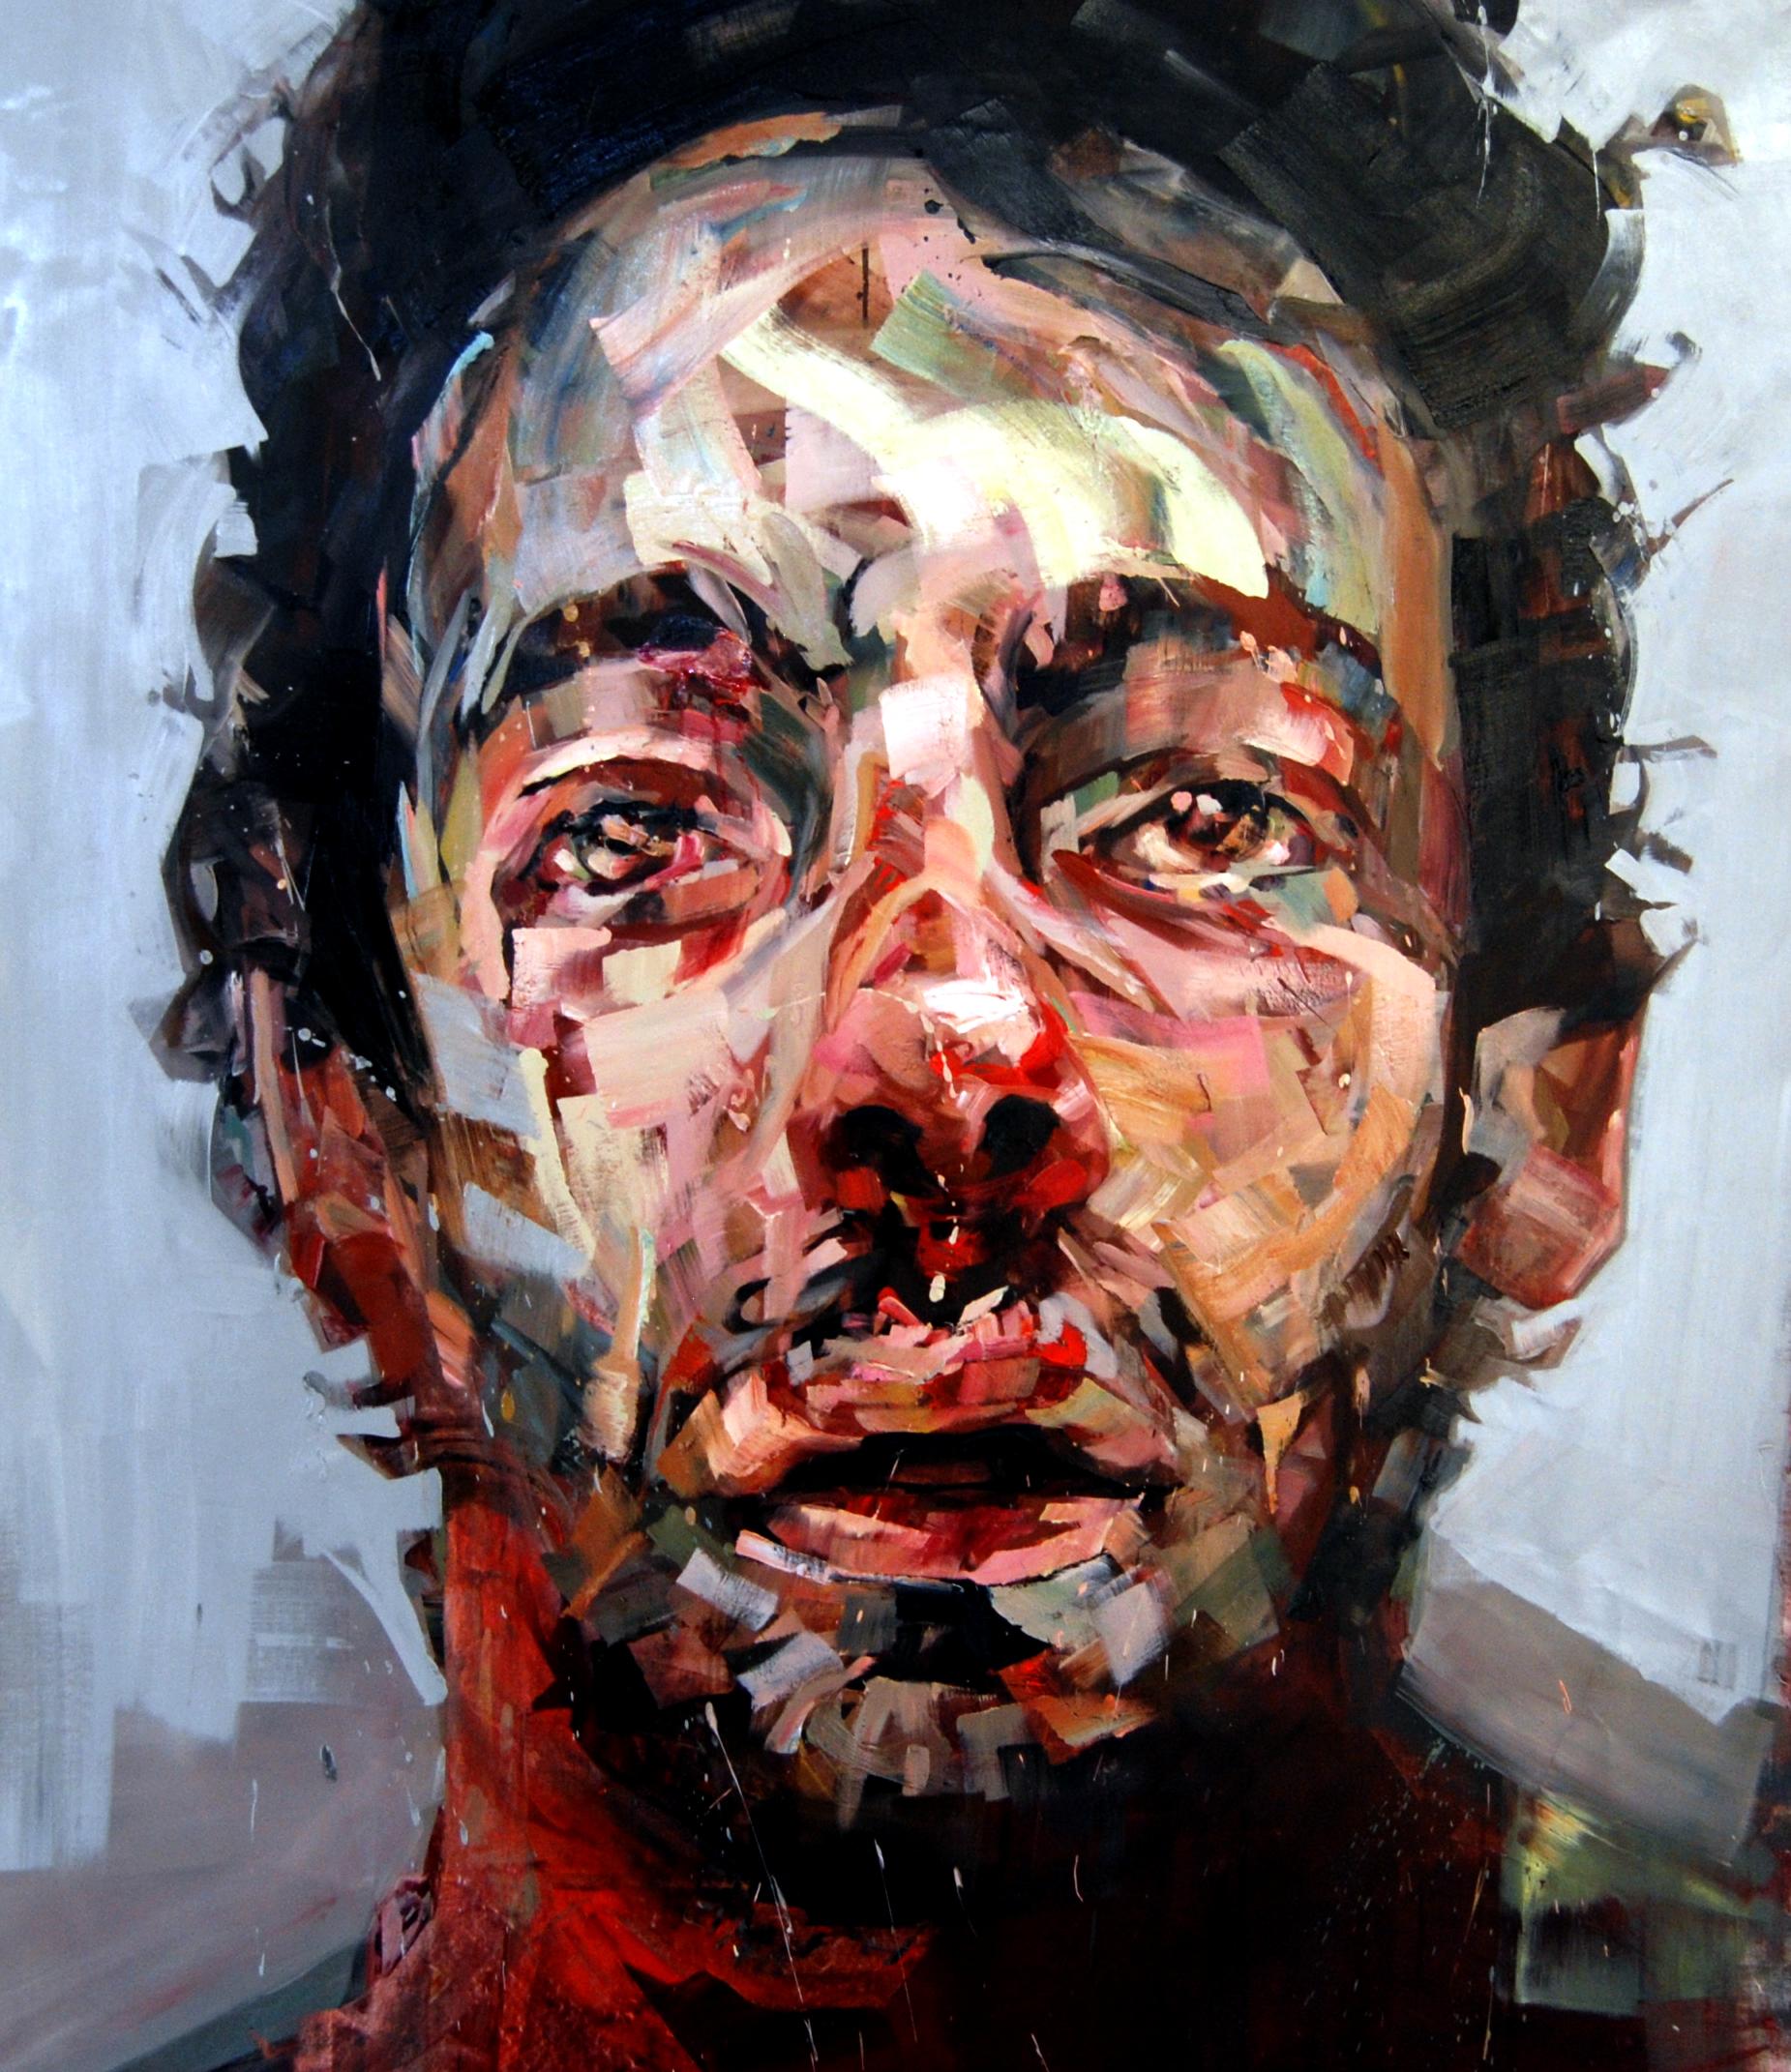 Andrew Salgado - If One Man's Joy is Another Man's Sadness (2012 - Beers.Lambert Contemporary)